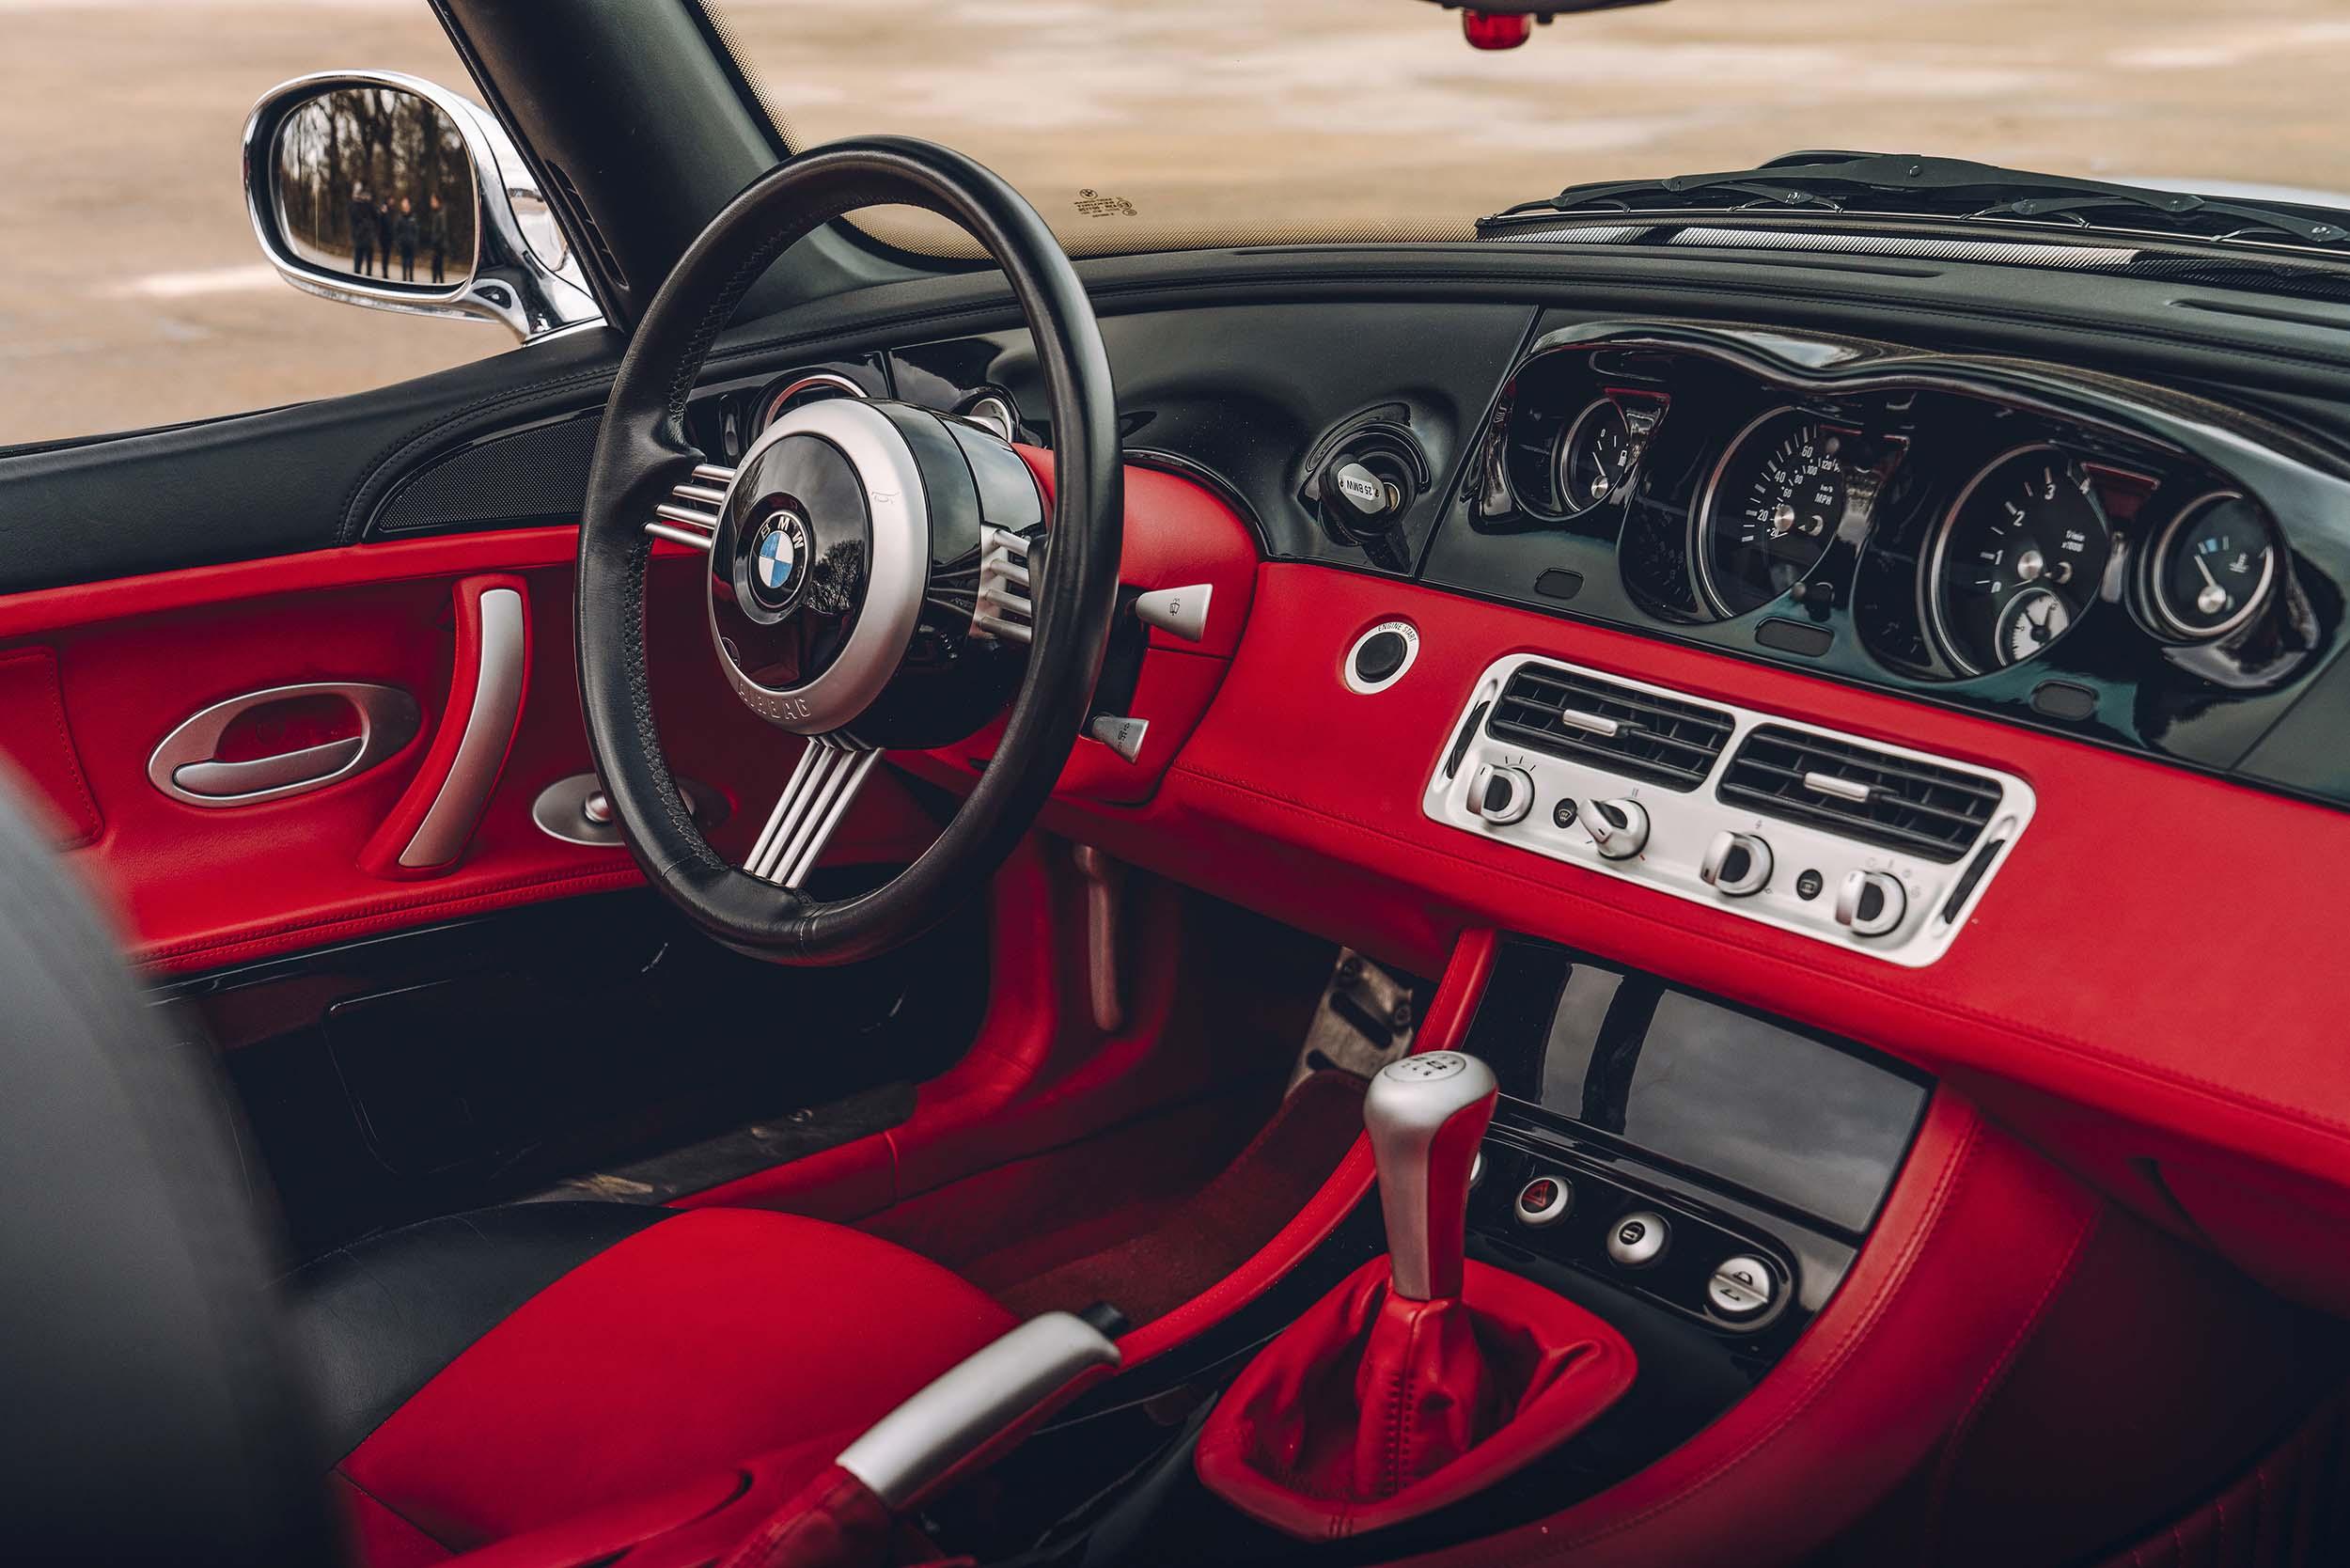 BMW Z8 interieur van James Bond (007)